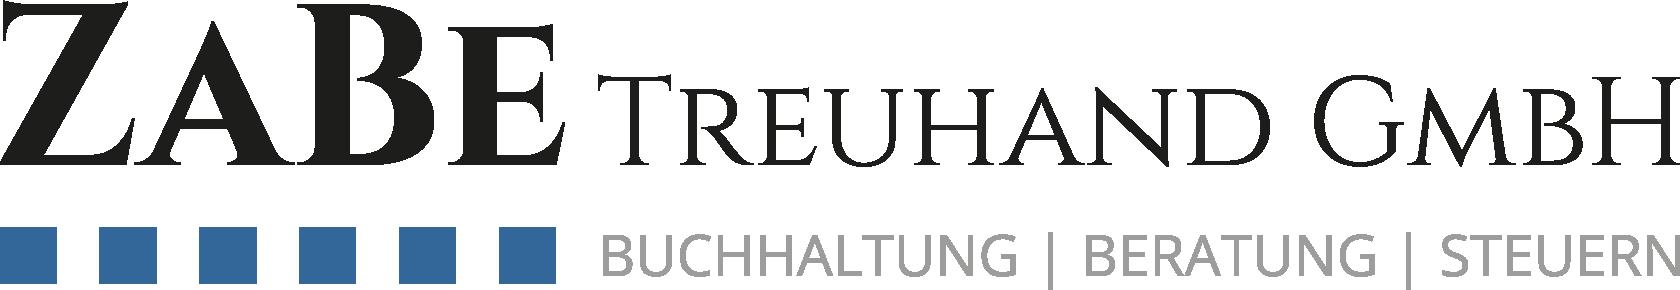 ZABE Treuhand GmbH